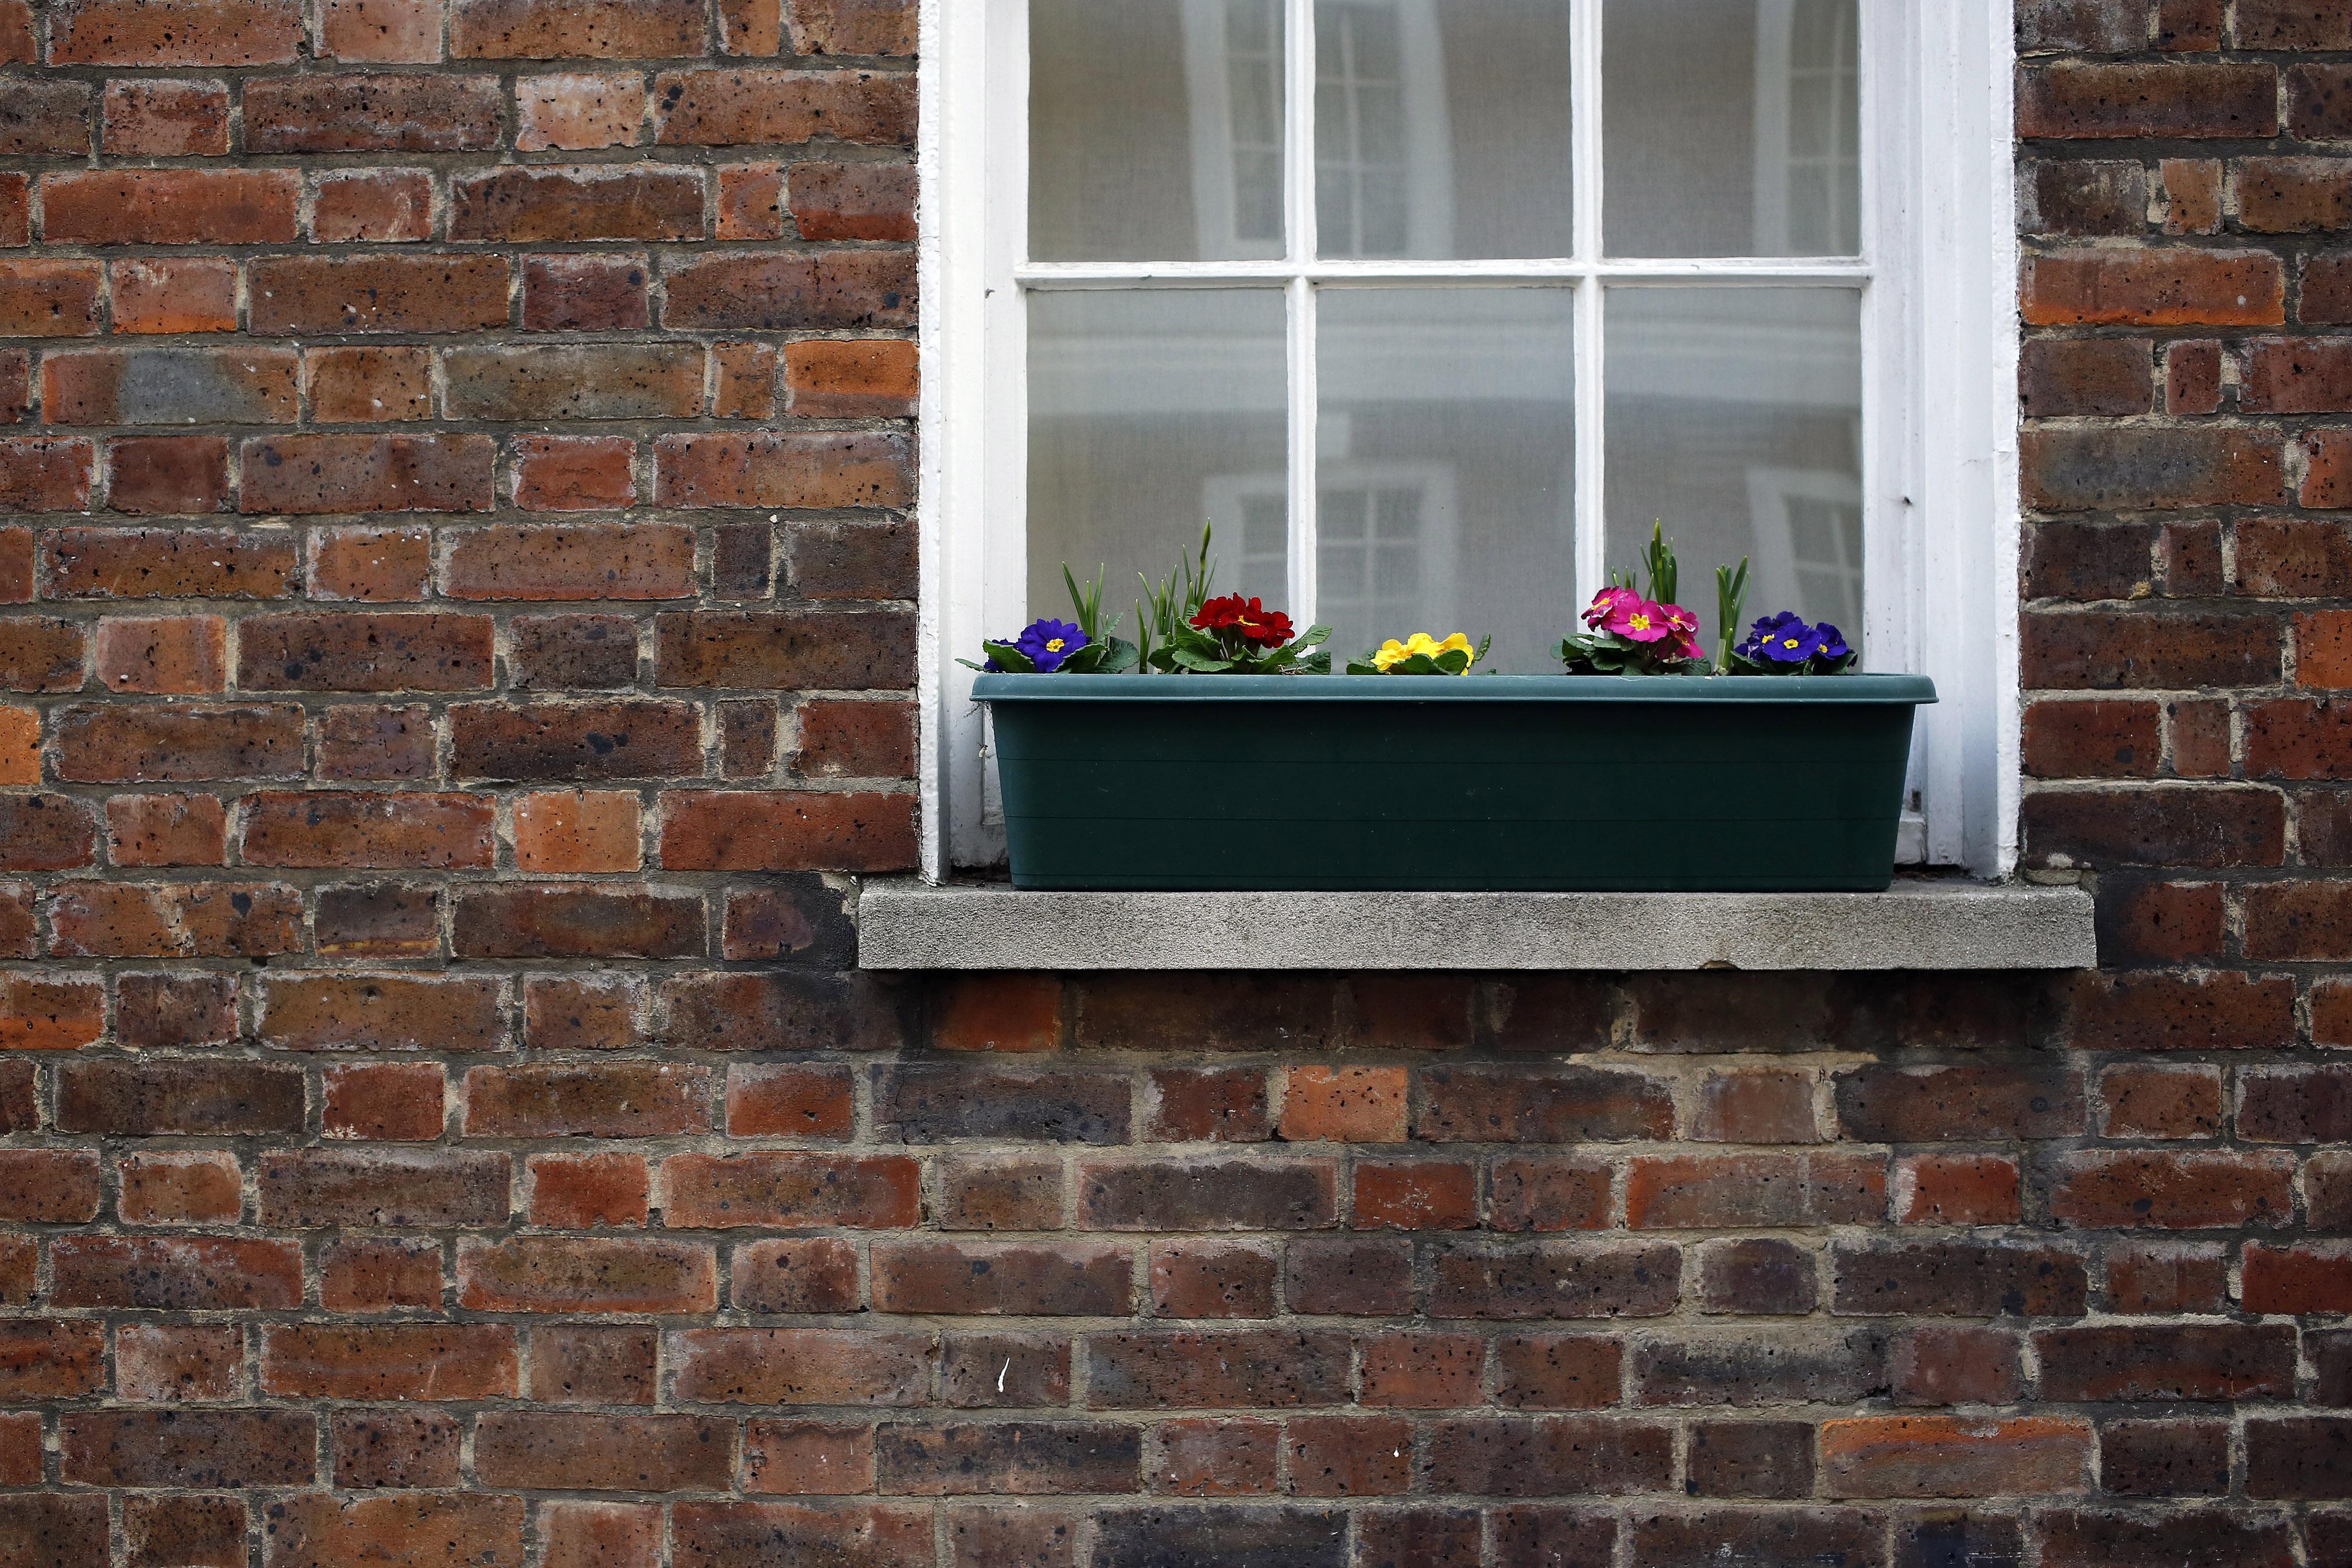 UK housing market stuck in slow gear as Brexit weighs - Nationwide